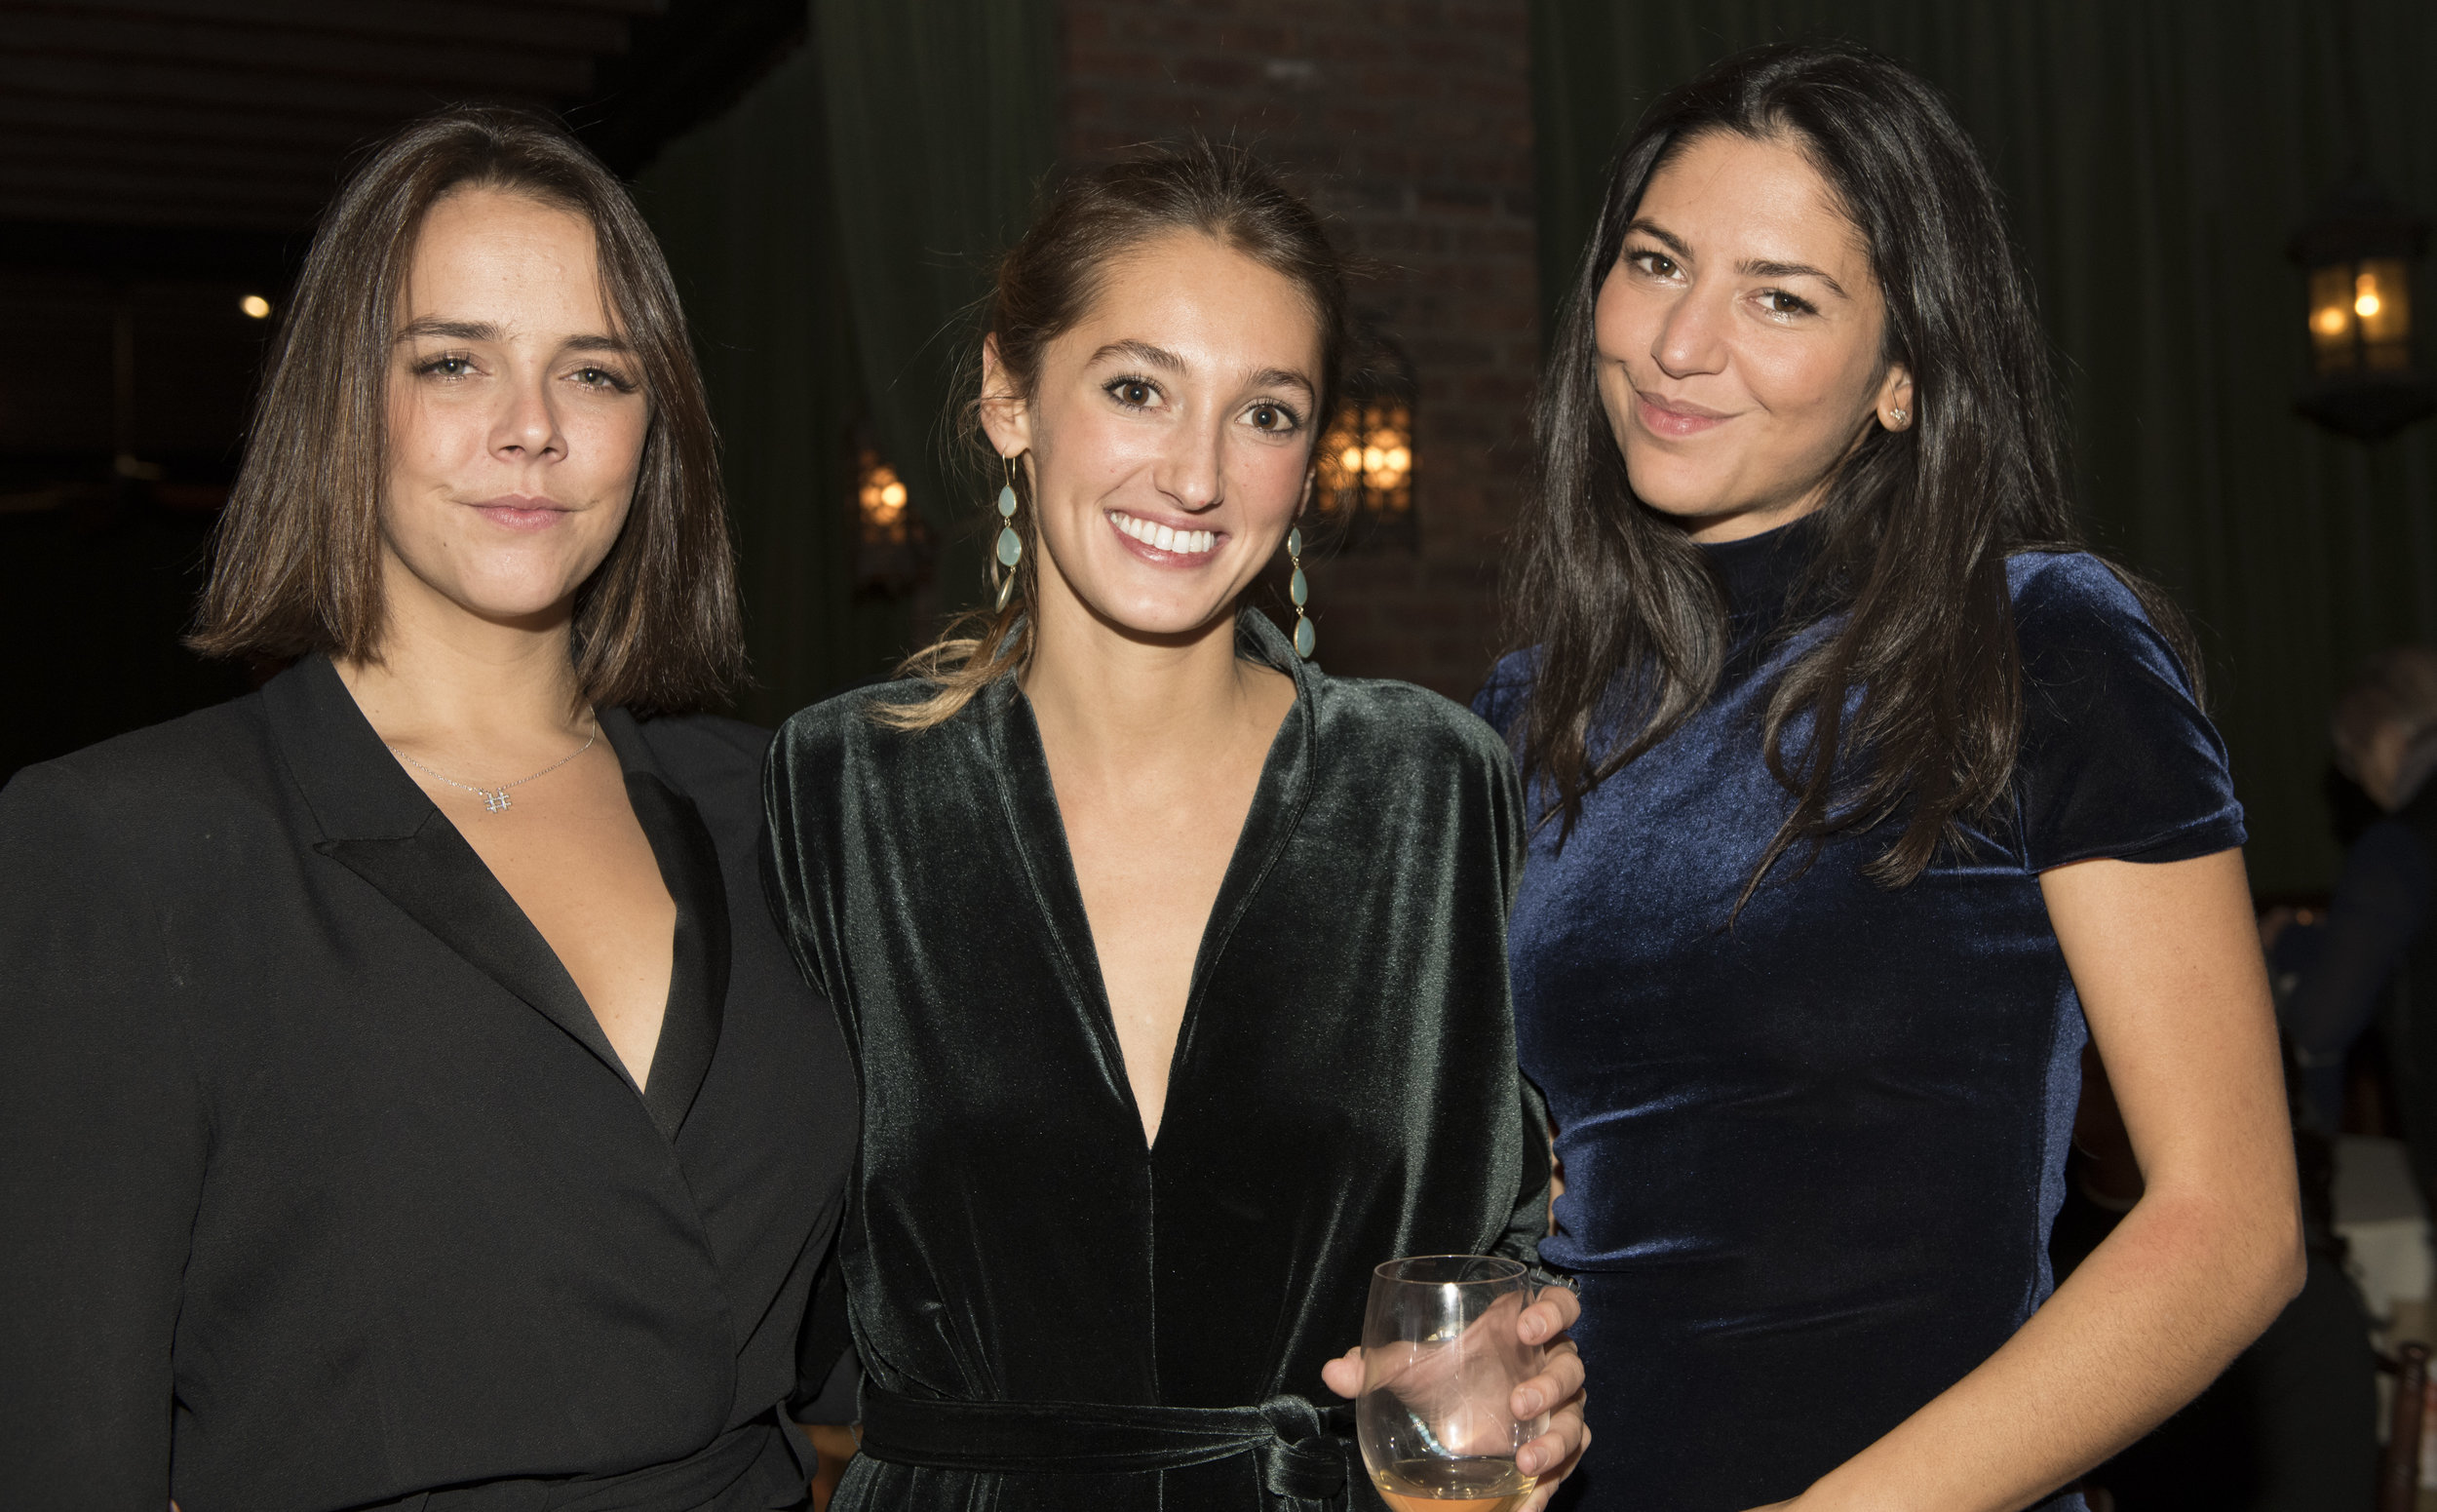 Pauline Ducruet, Julia Pittorino and Schanel Bakkouche